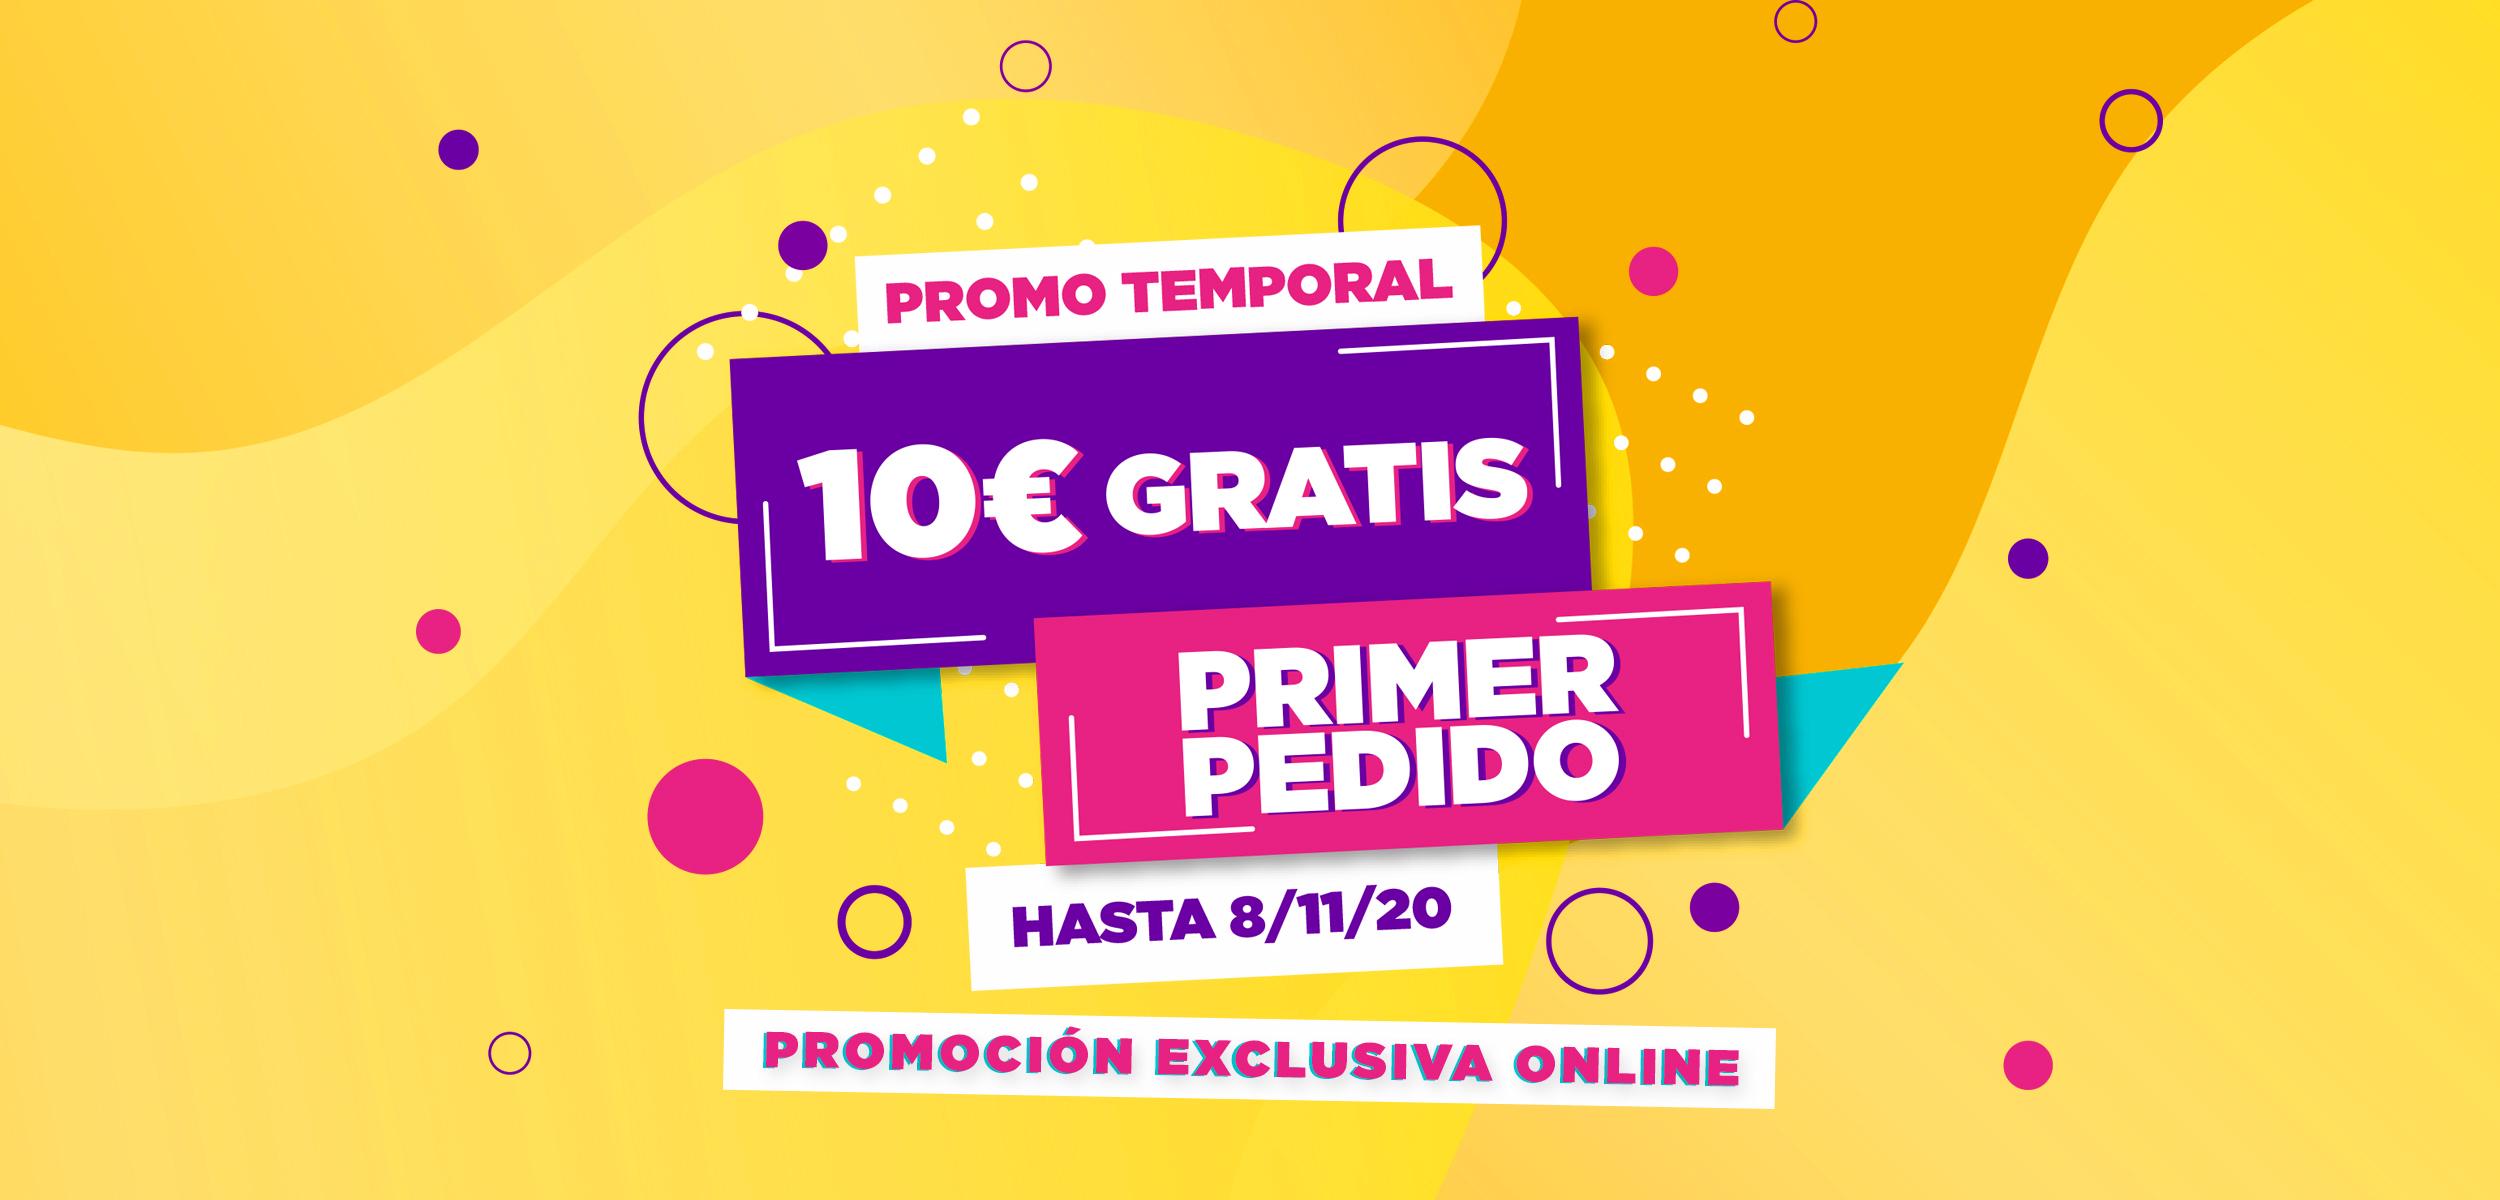 10€ gratis en imprenta online